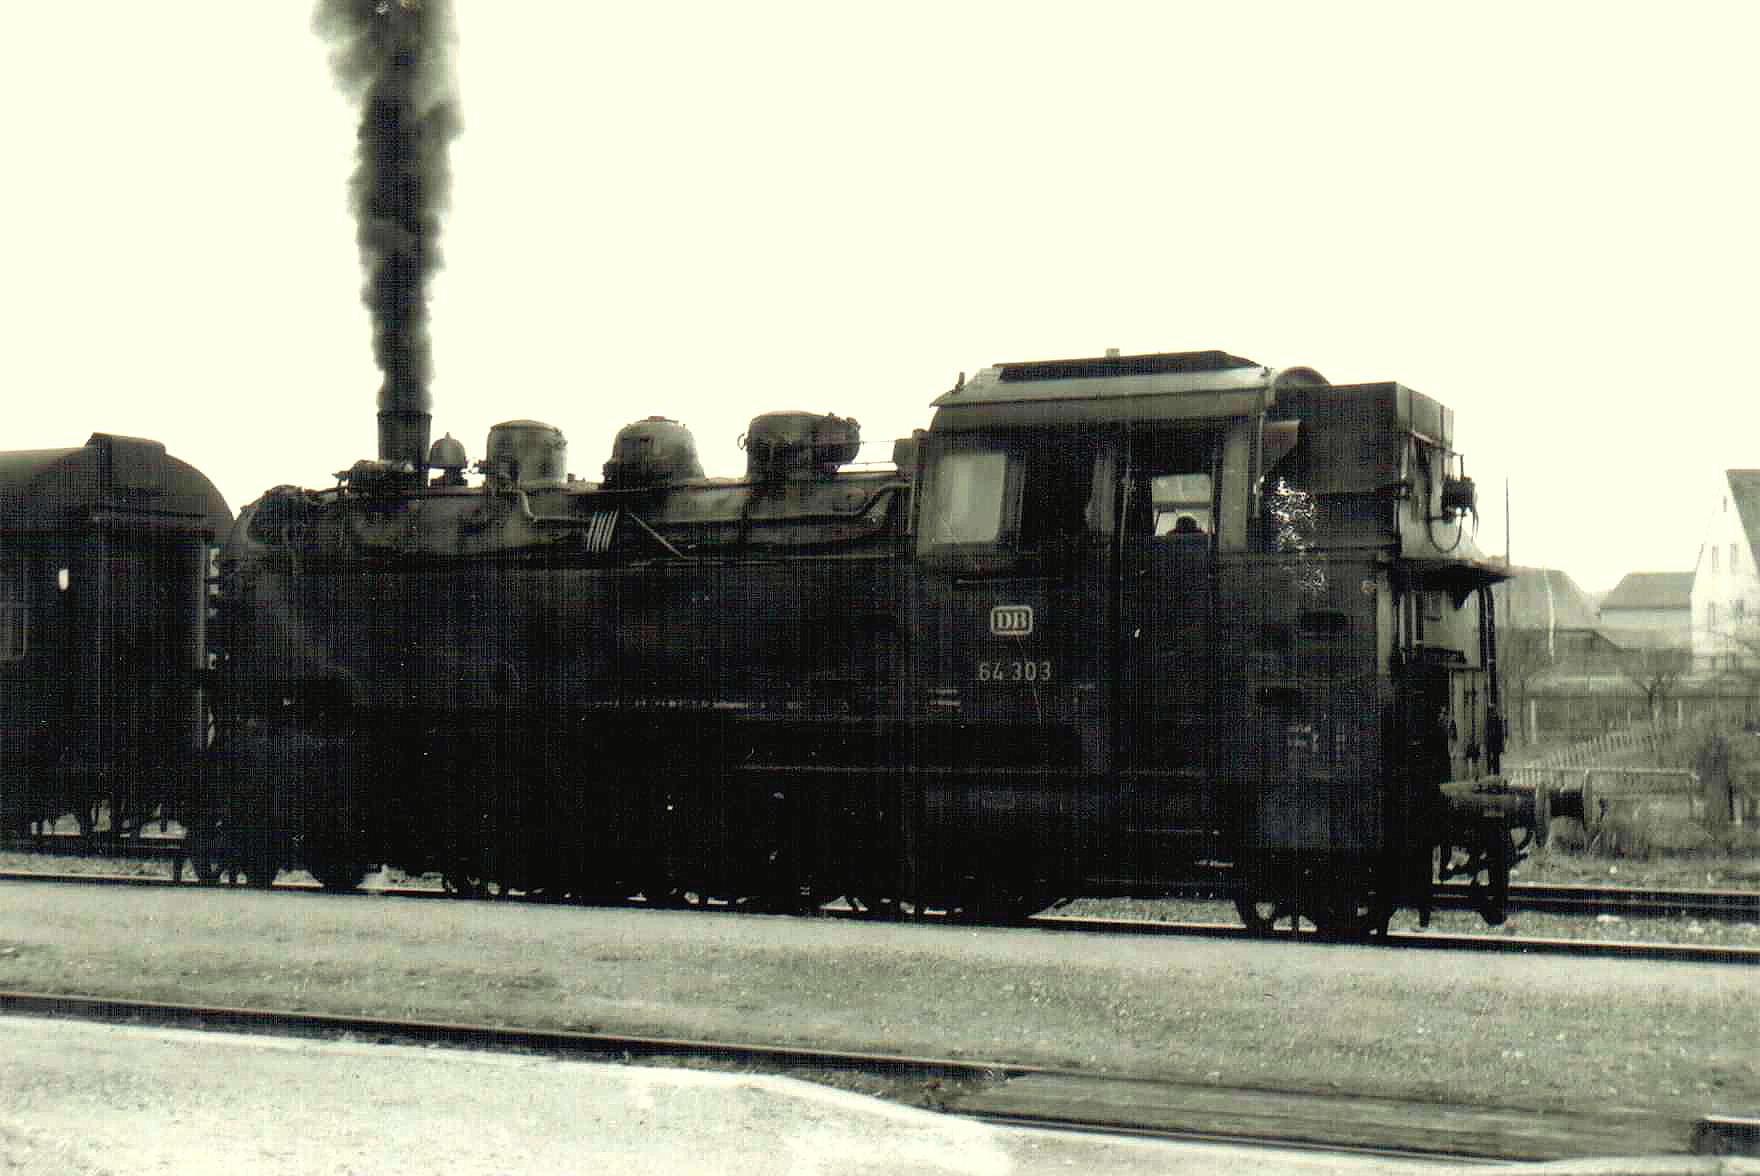 64 303 abfahrbereit Gleis 2 Feuchtwangen nach Dombühl 1963/64